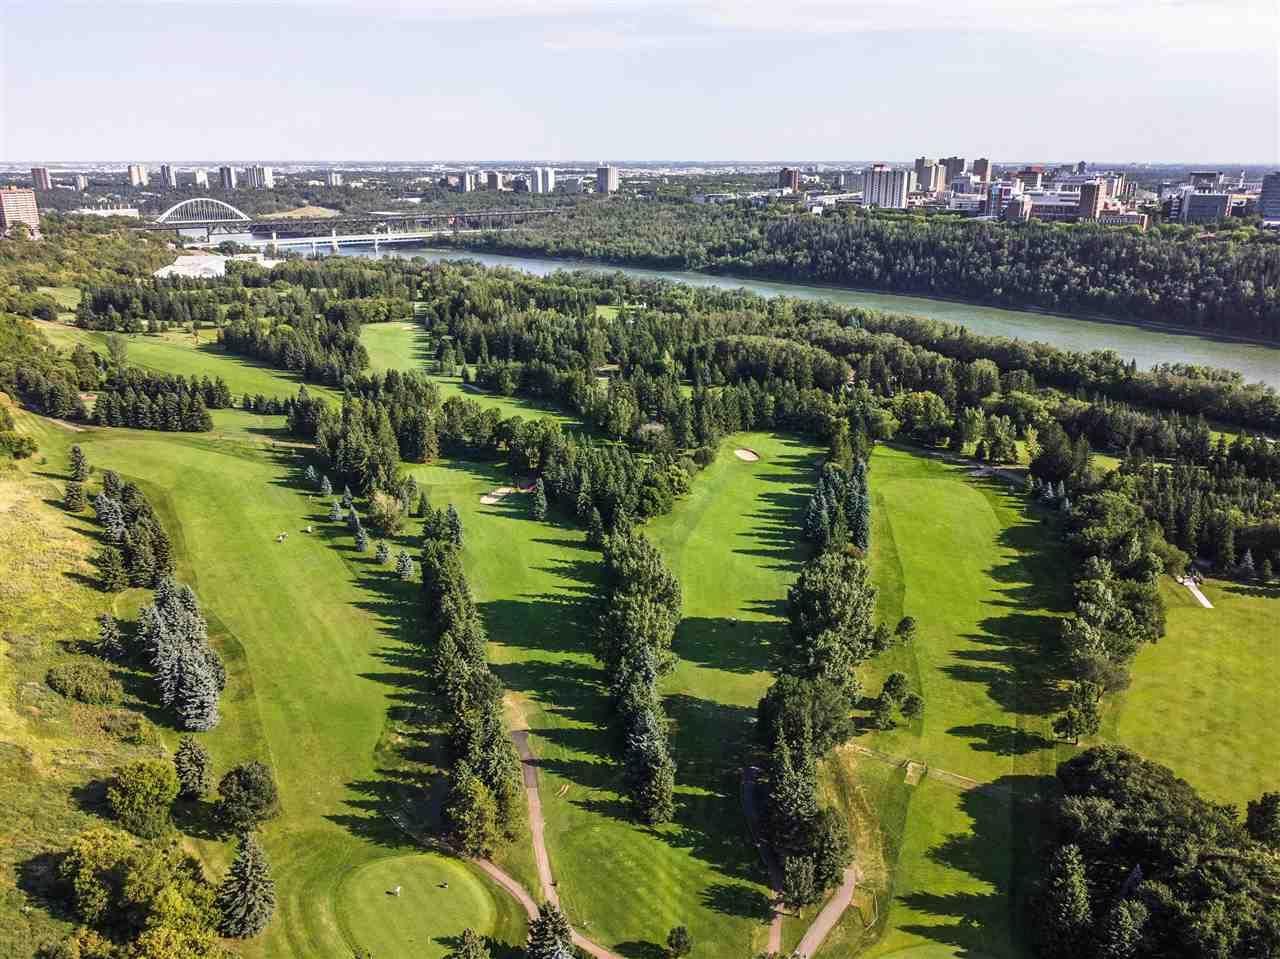 Photo 48: Photos: 1703 11920 100 Avenue in Edmonton: Zone 12 Condo for sale : MLS®# E4233731